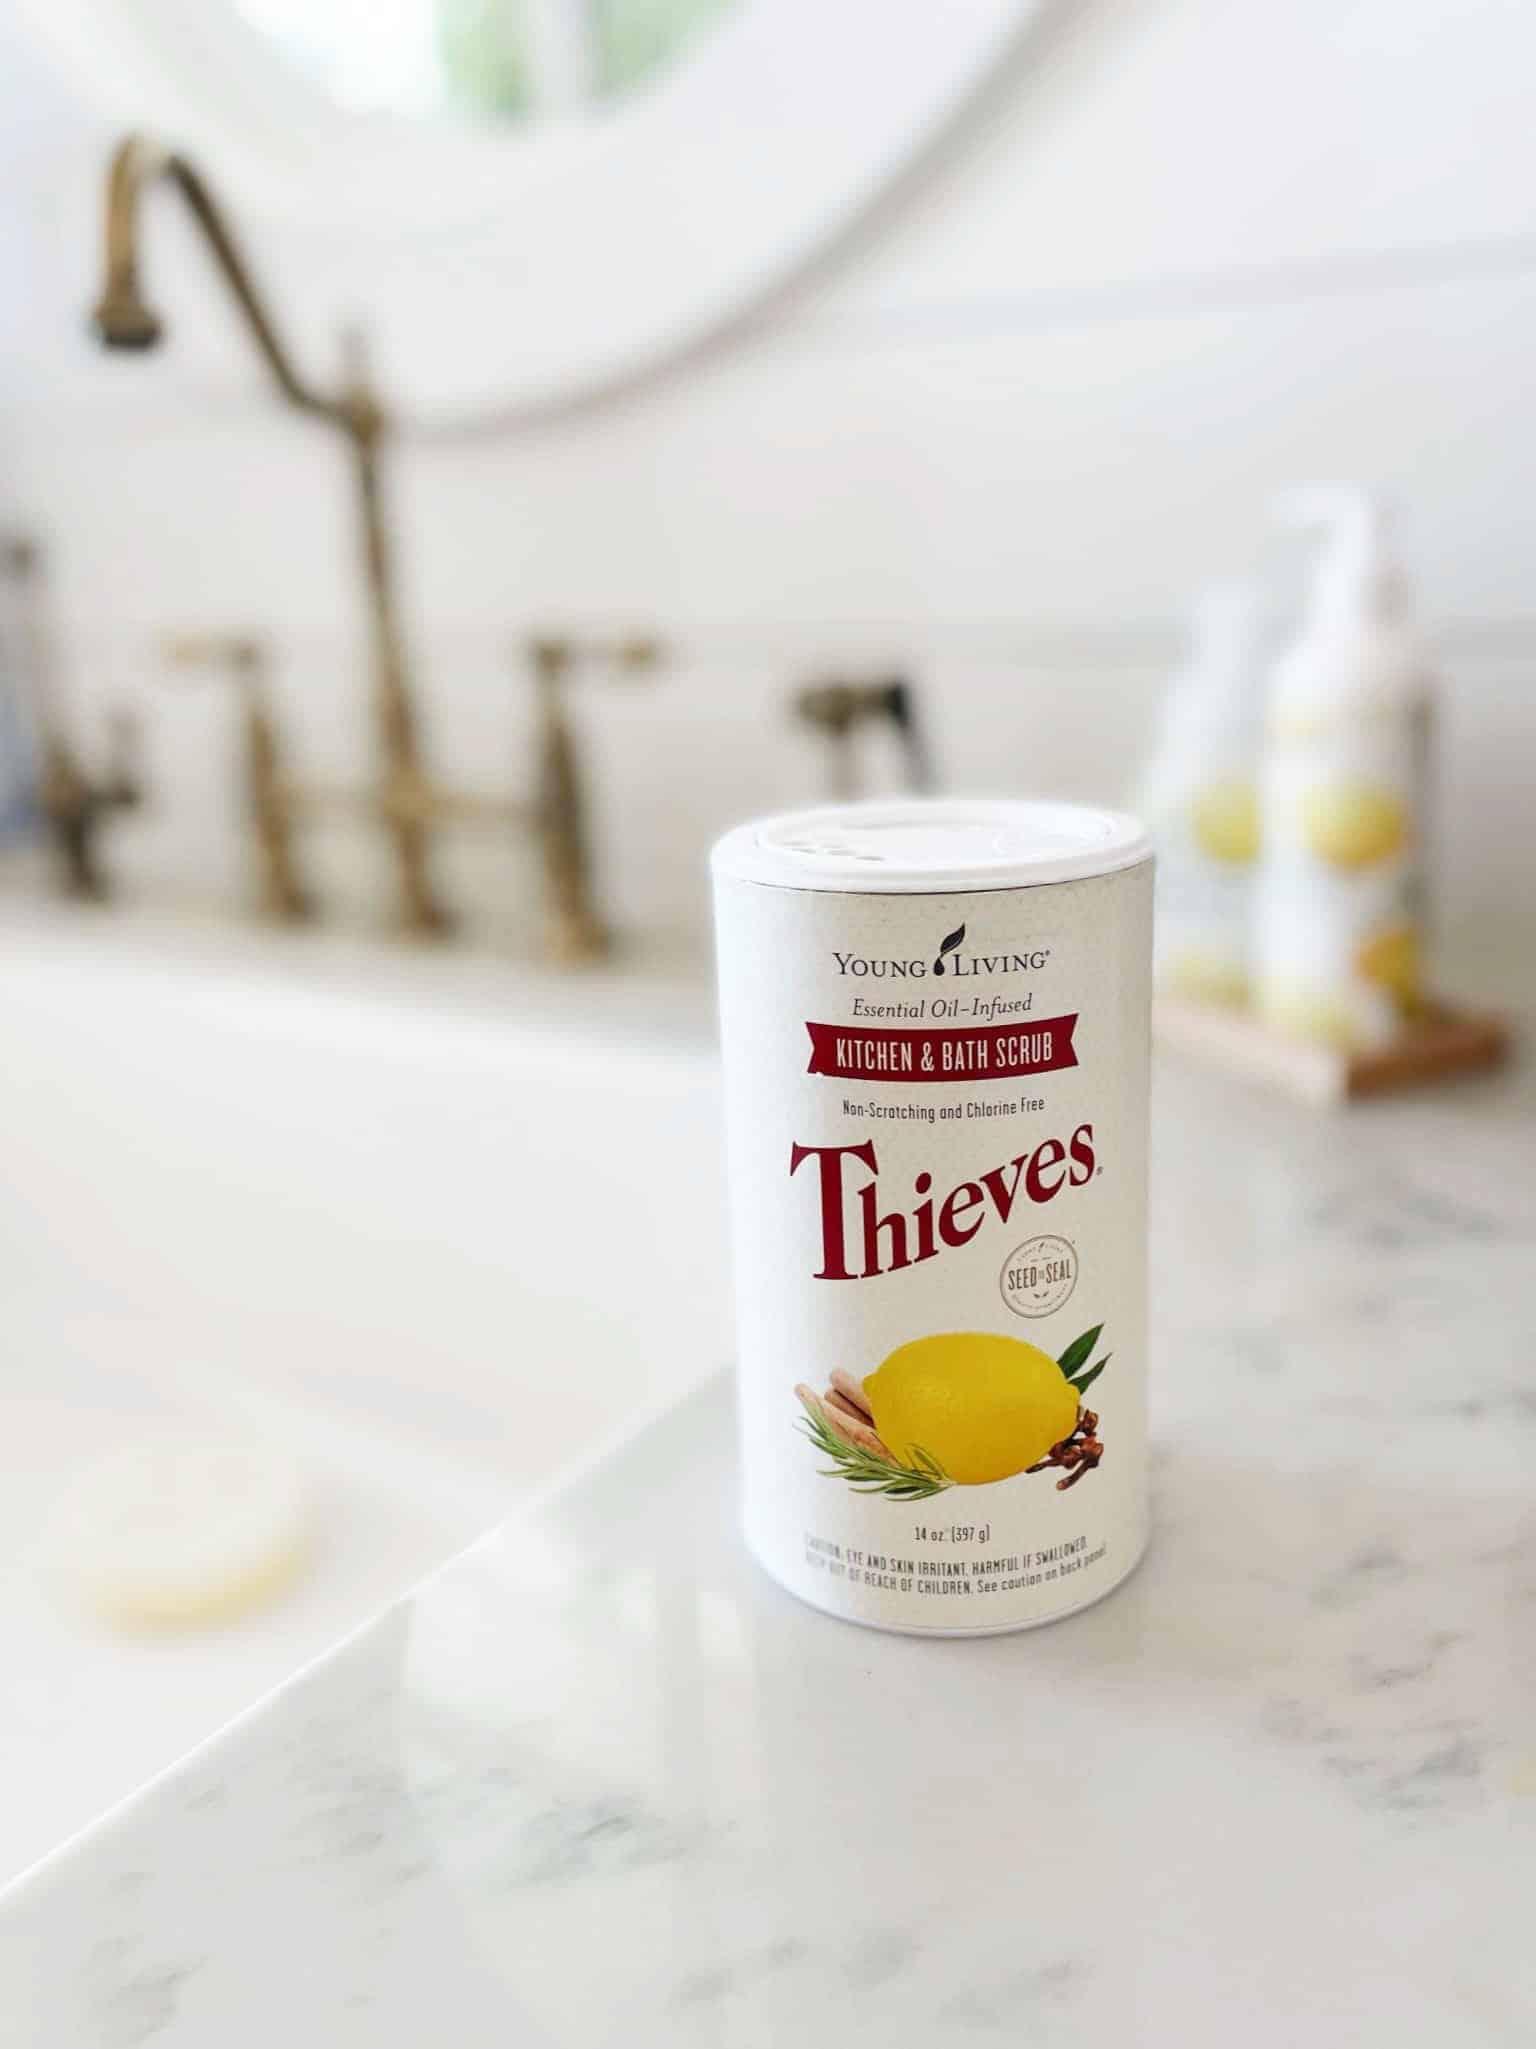 Thieves Kitchen and Bath Scrub: My New Favorite Cleaning Scrub!